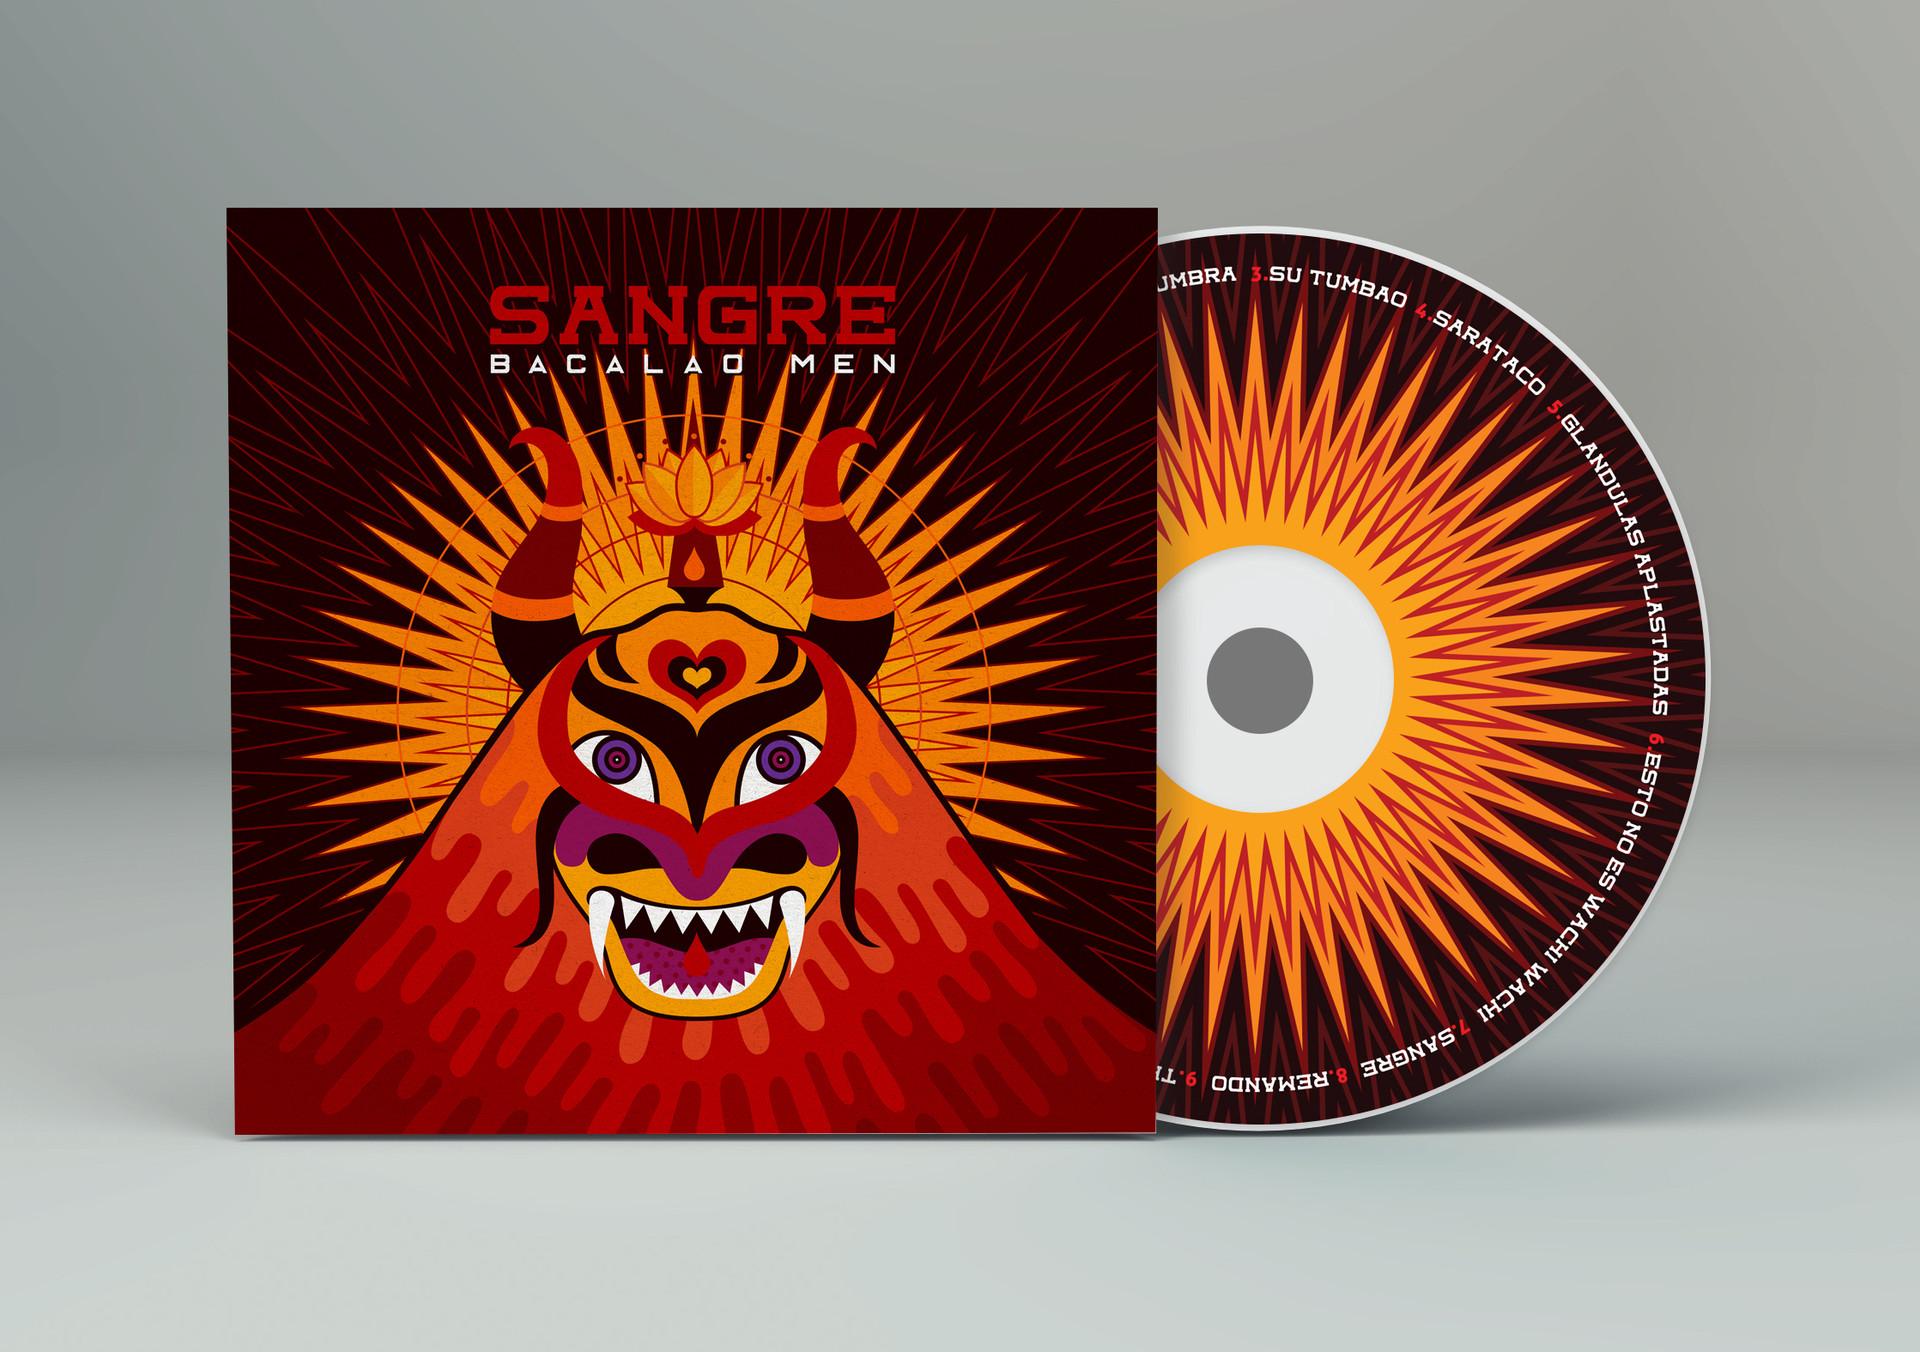 CD Bacalao Men